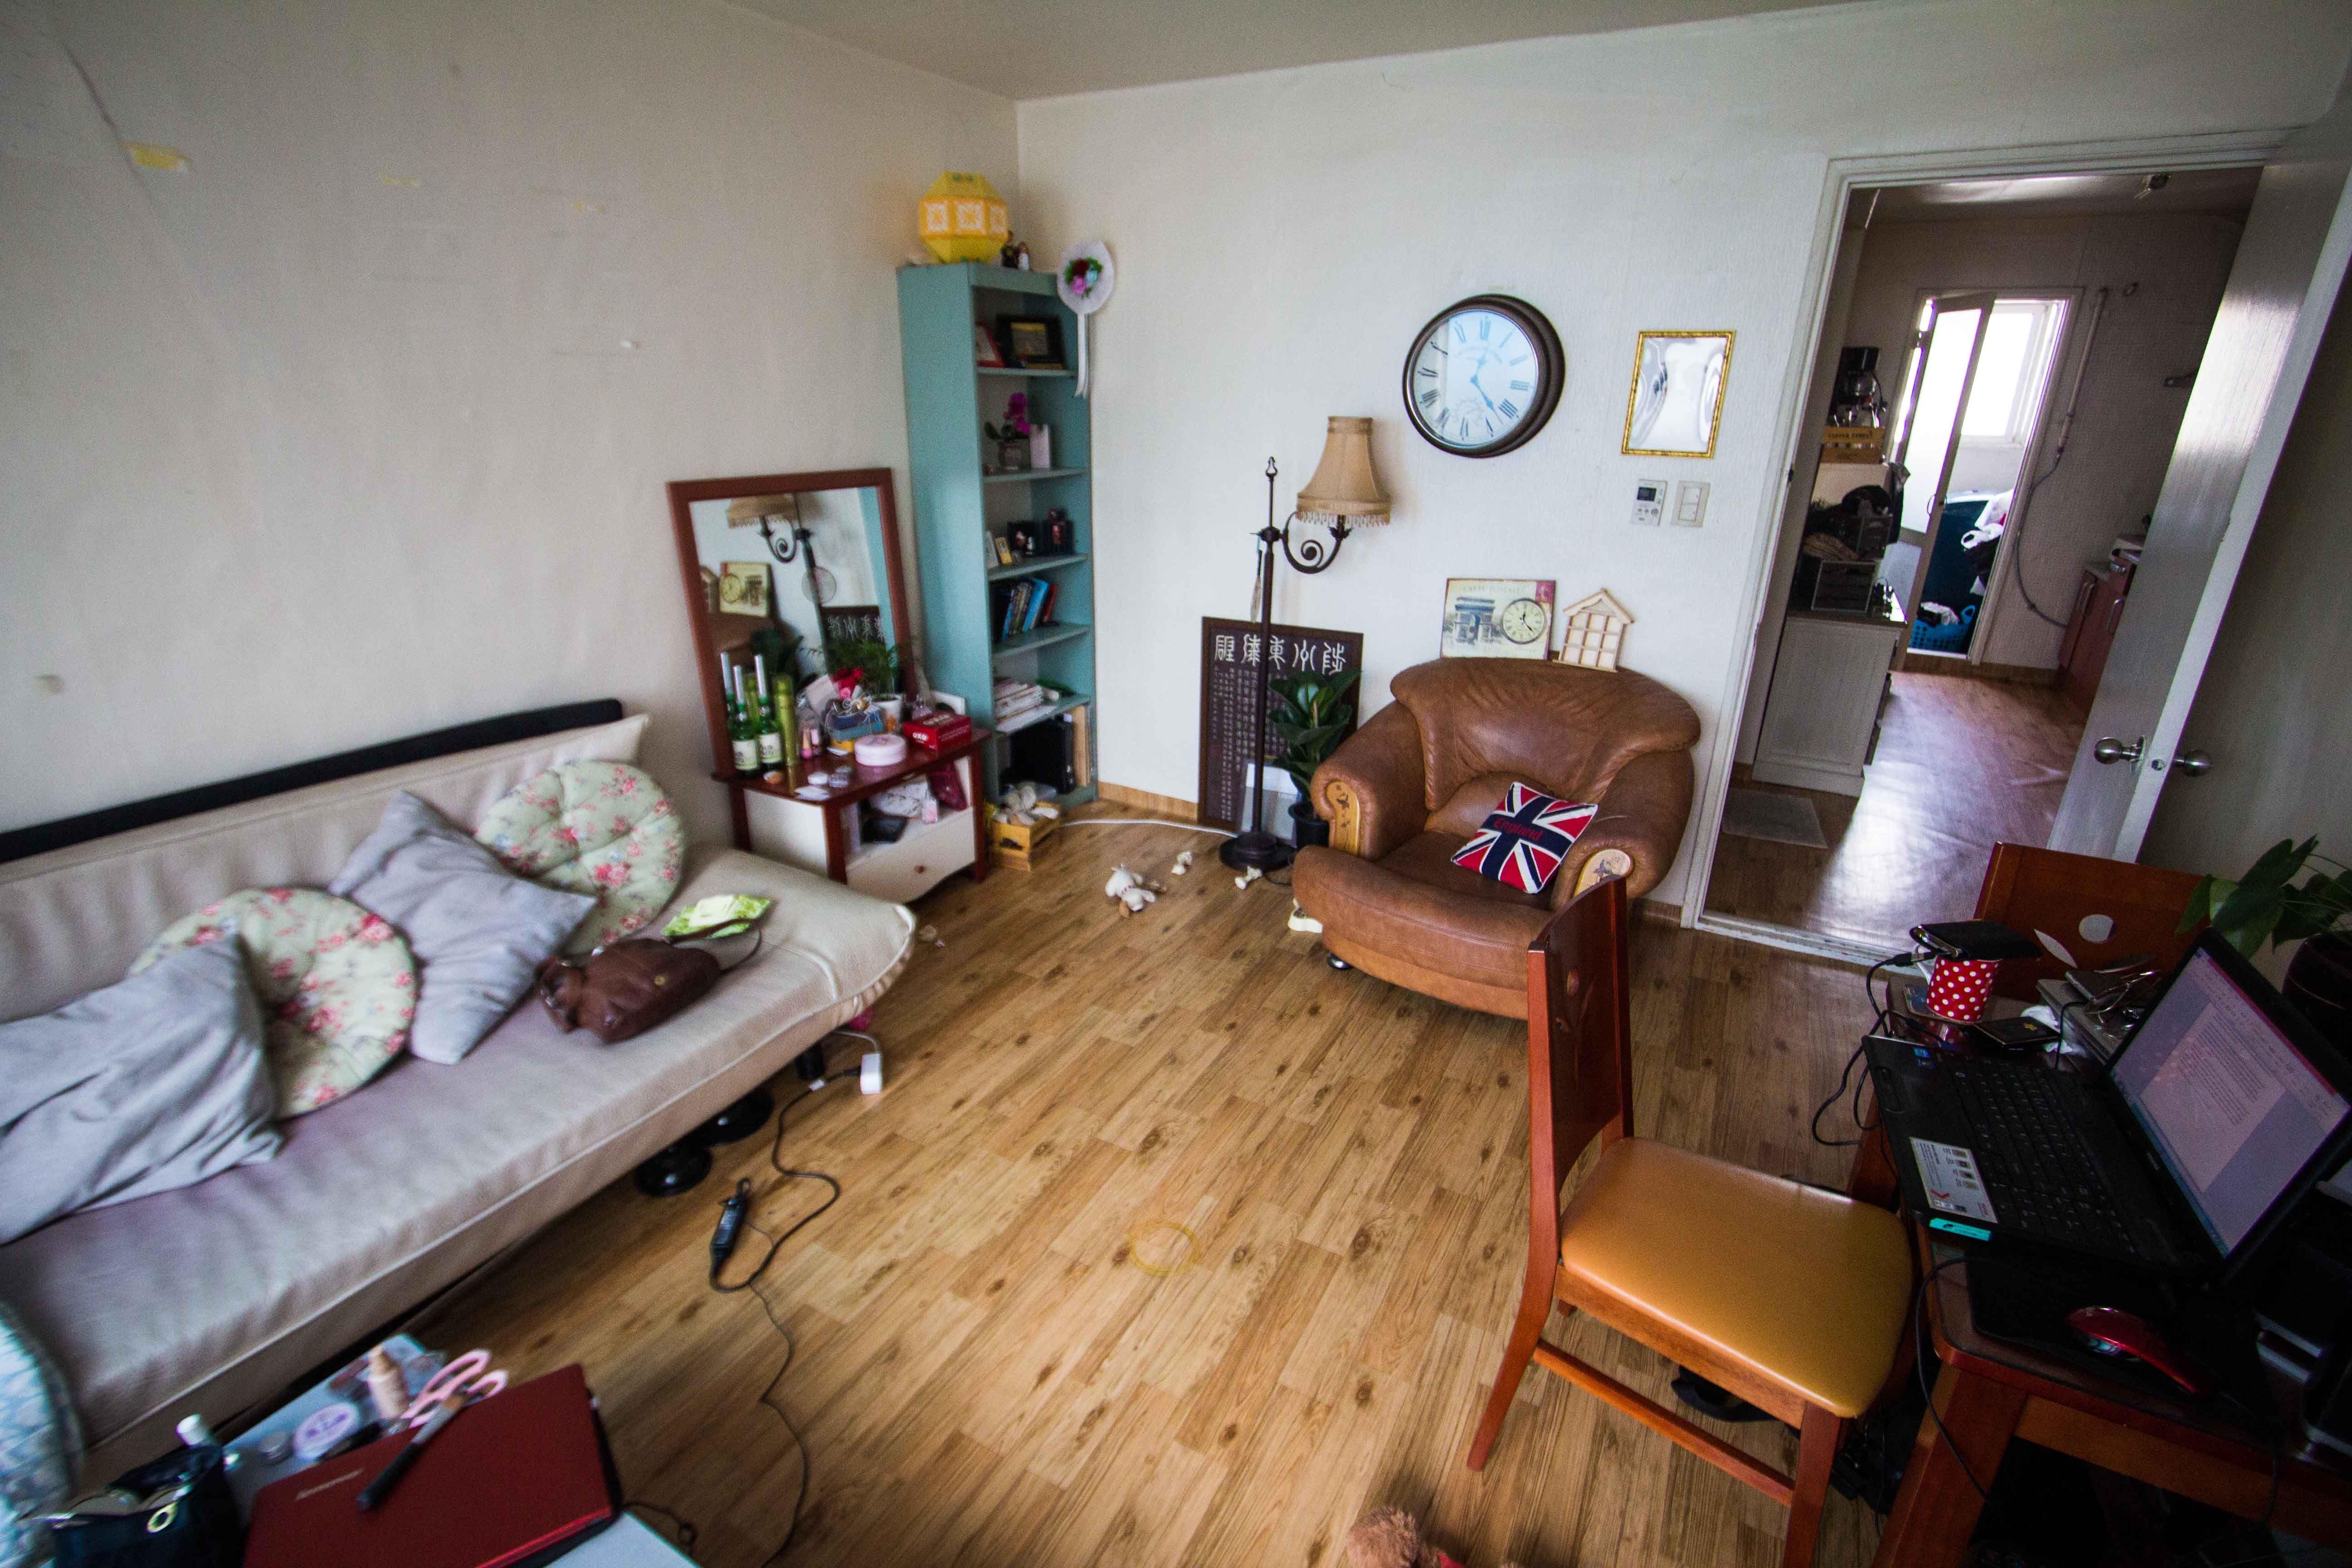 Apartment Inside Poor poor london flat interior - google search | garage soaps